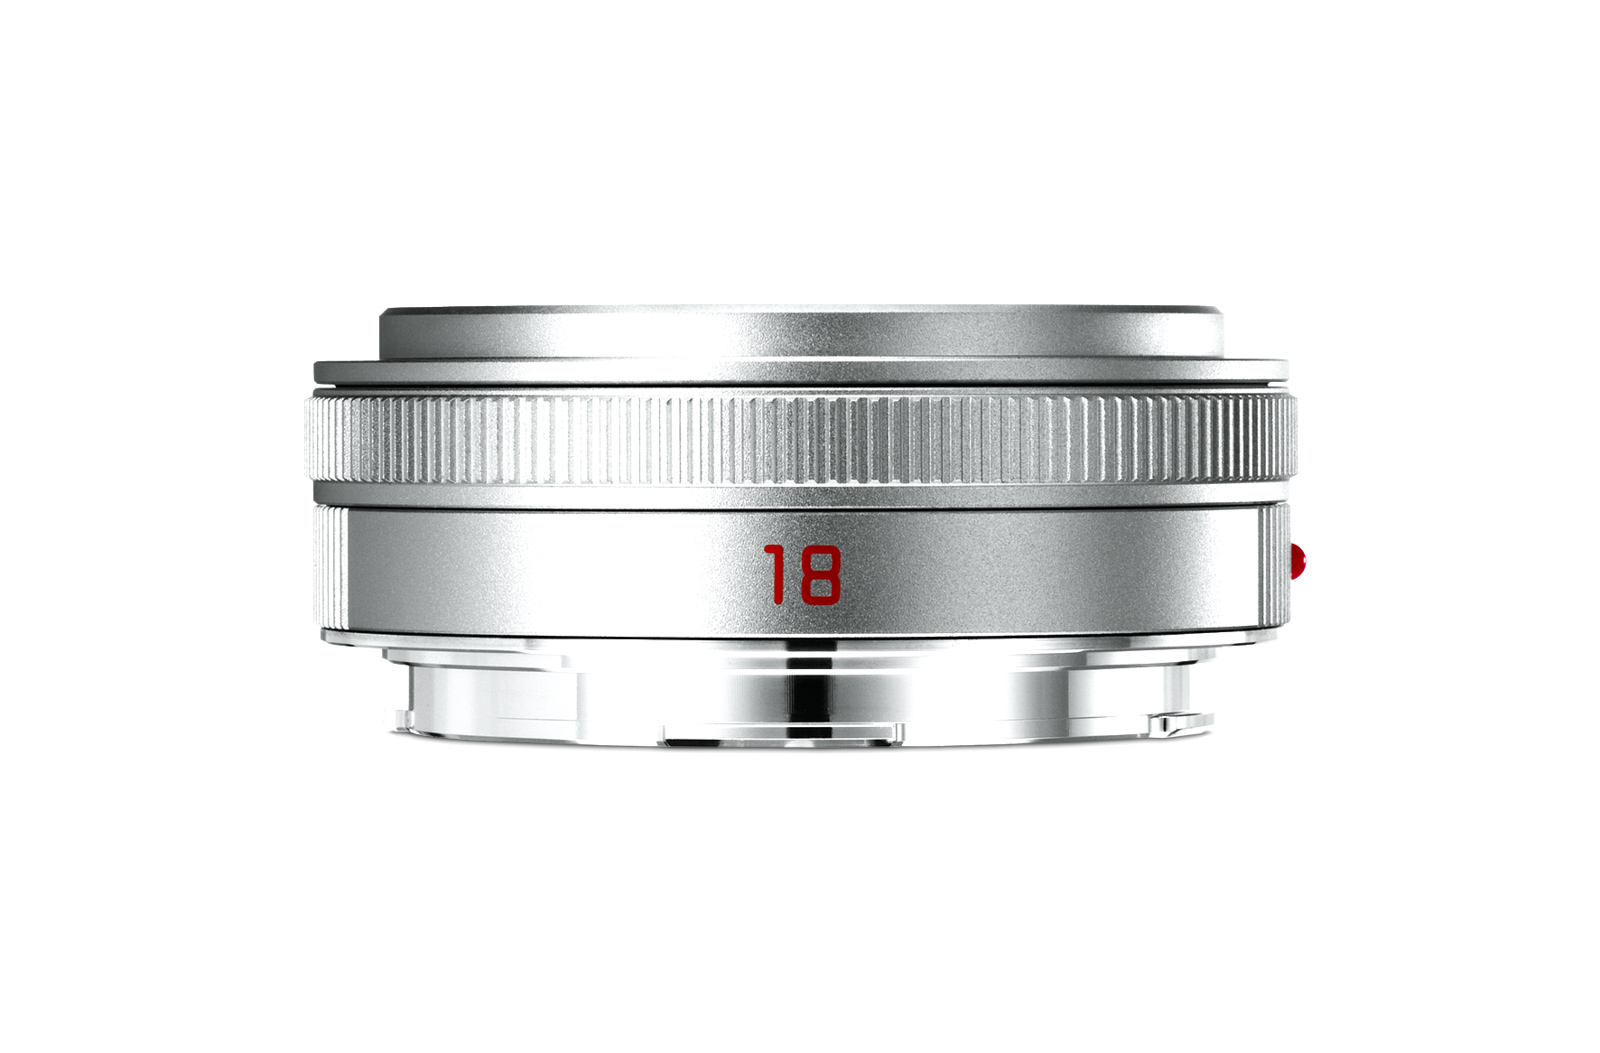 Leica Elmarit-TL 1:2.8/18 ASPH